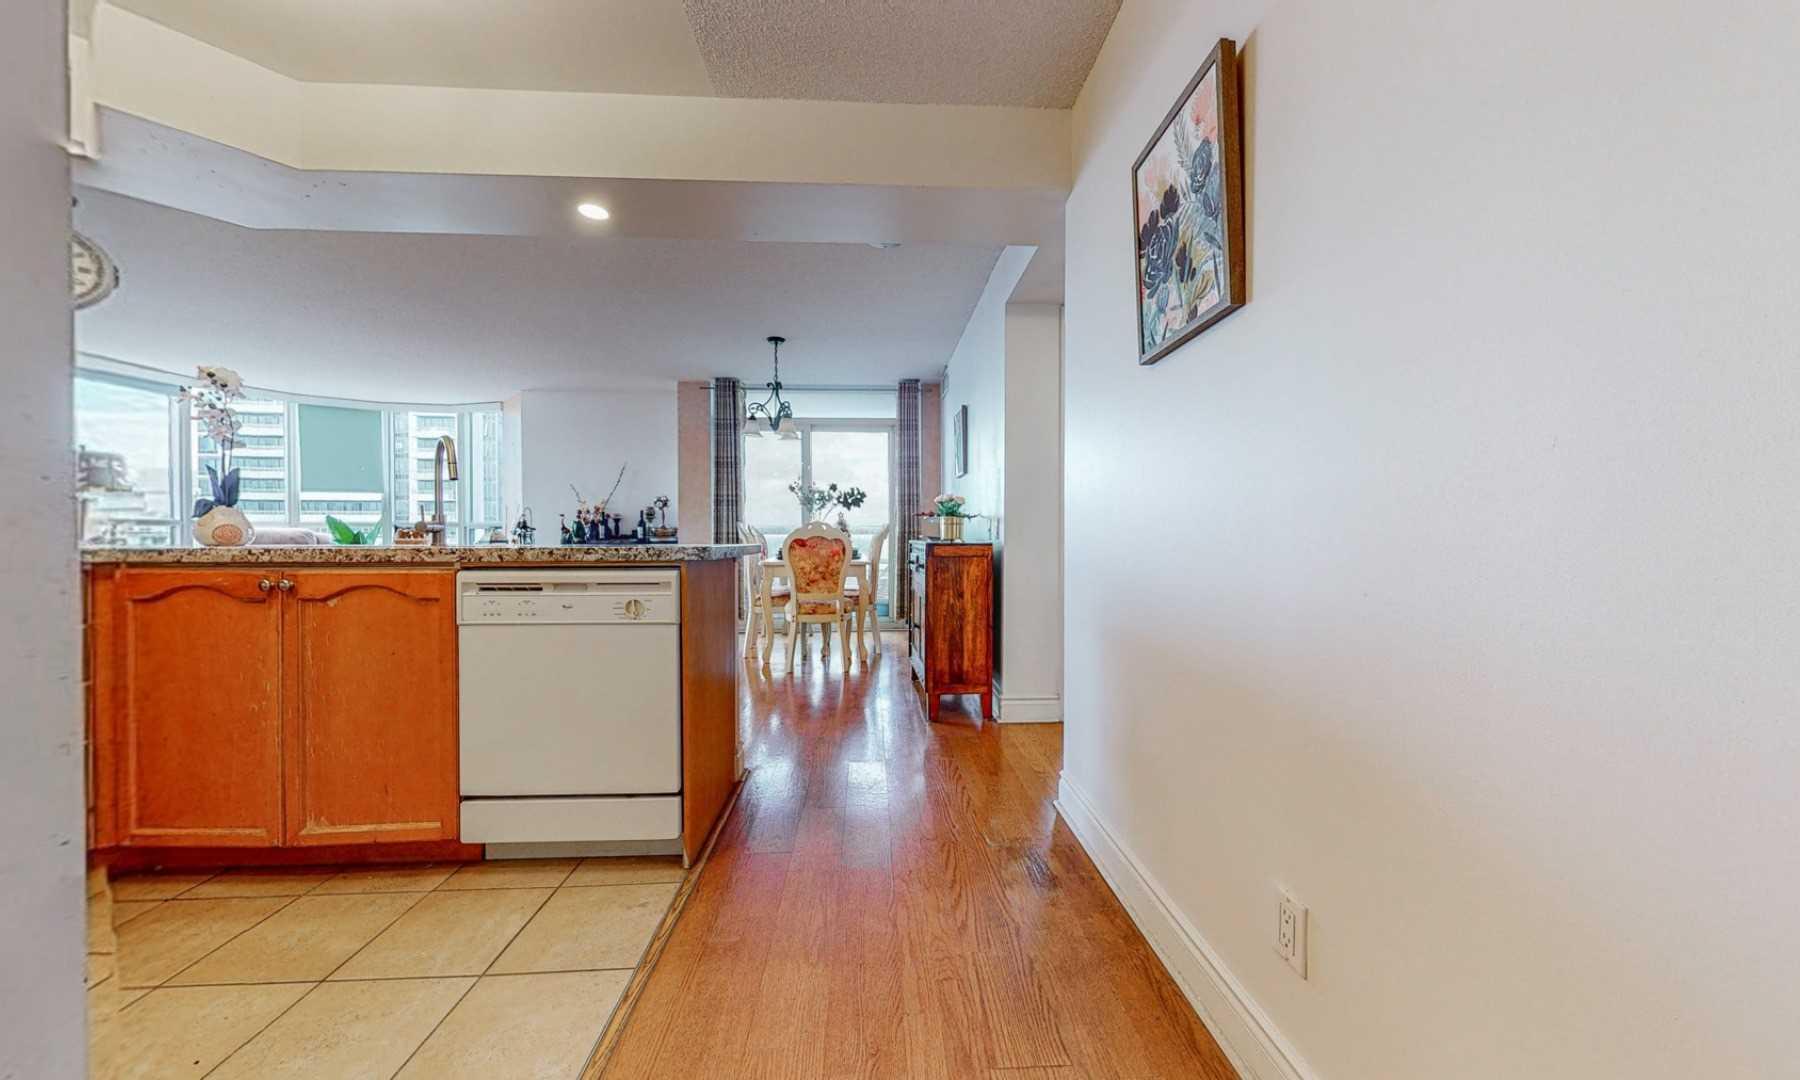 Condo Apt For Sale In Toronto , 2 Bedrooms Bedrooms, ,2 BathroomsBathrooms,Condo Apt,For Sale,1402,Northtown